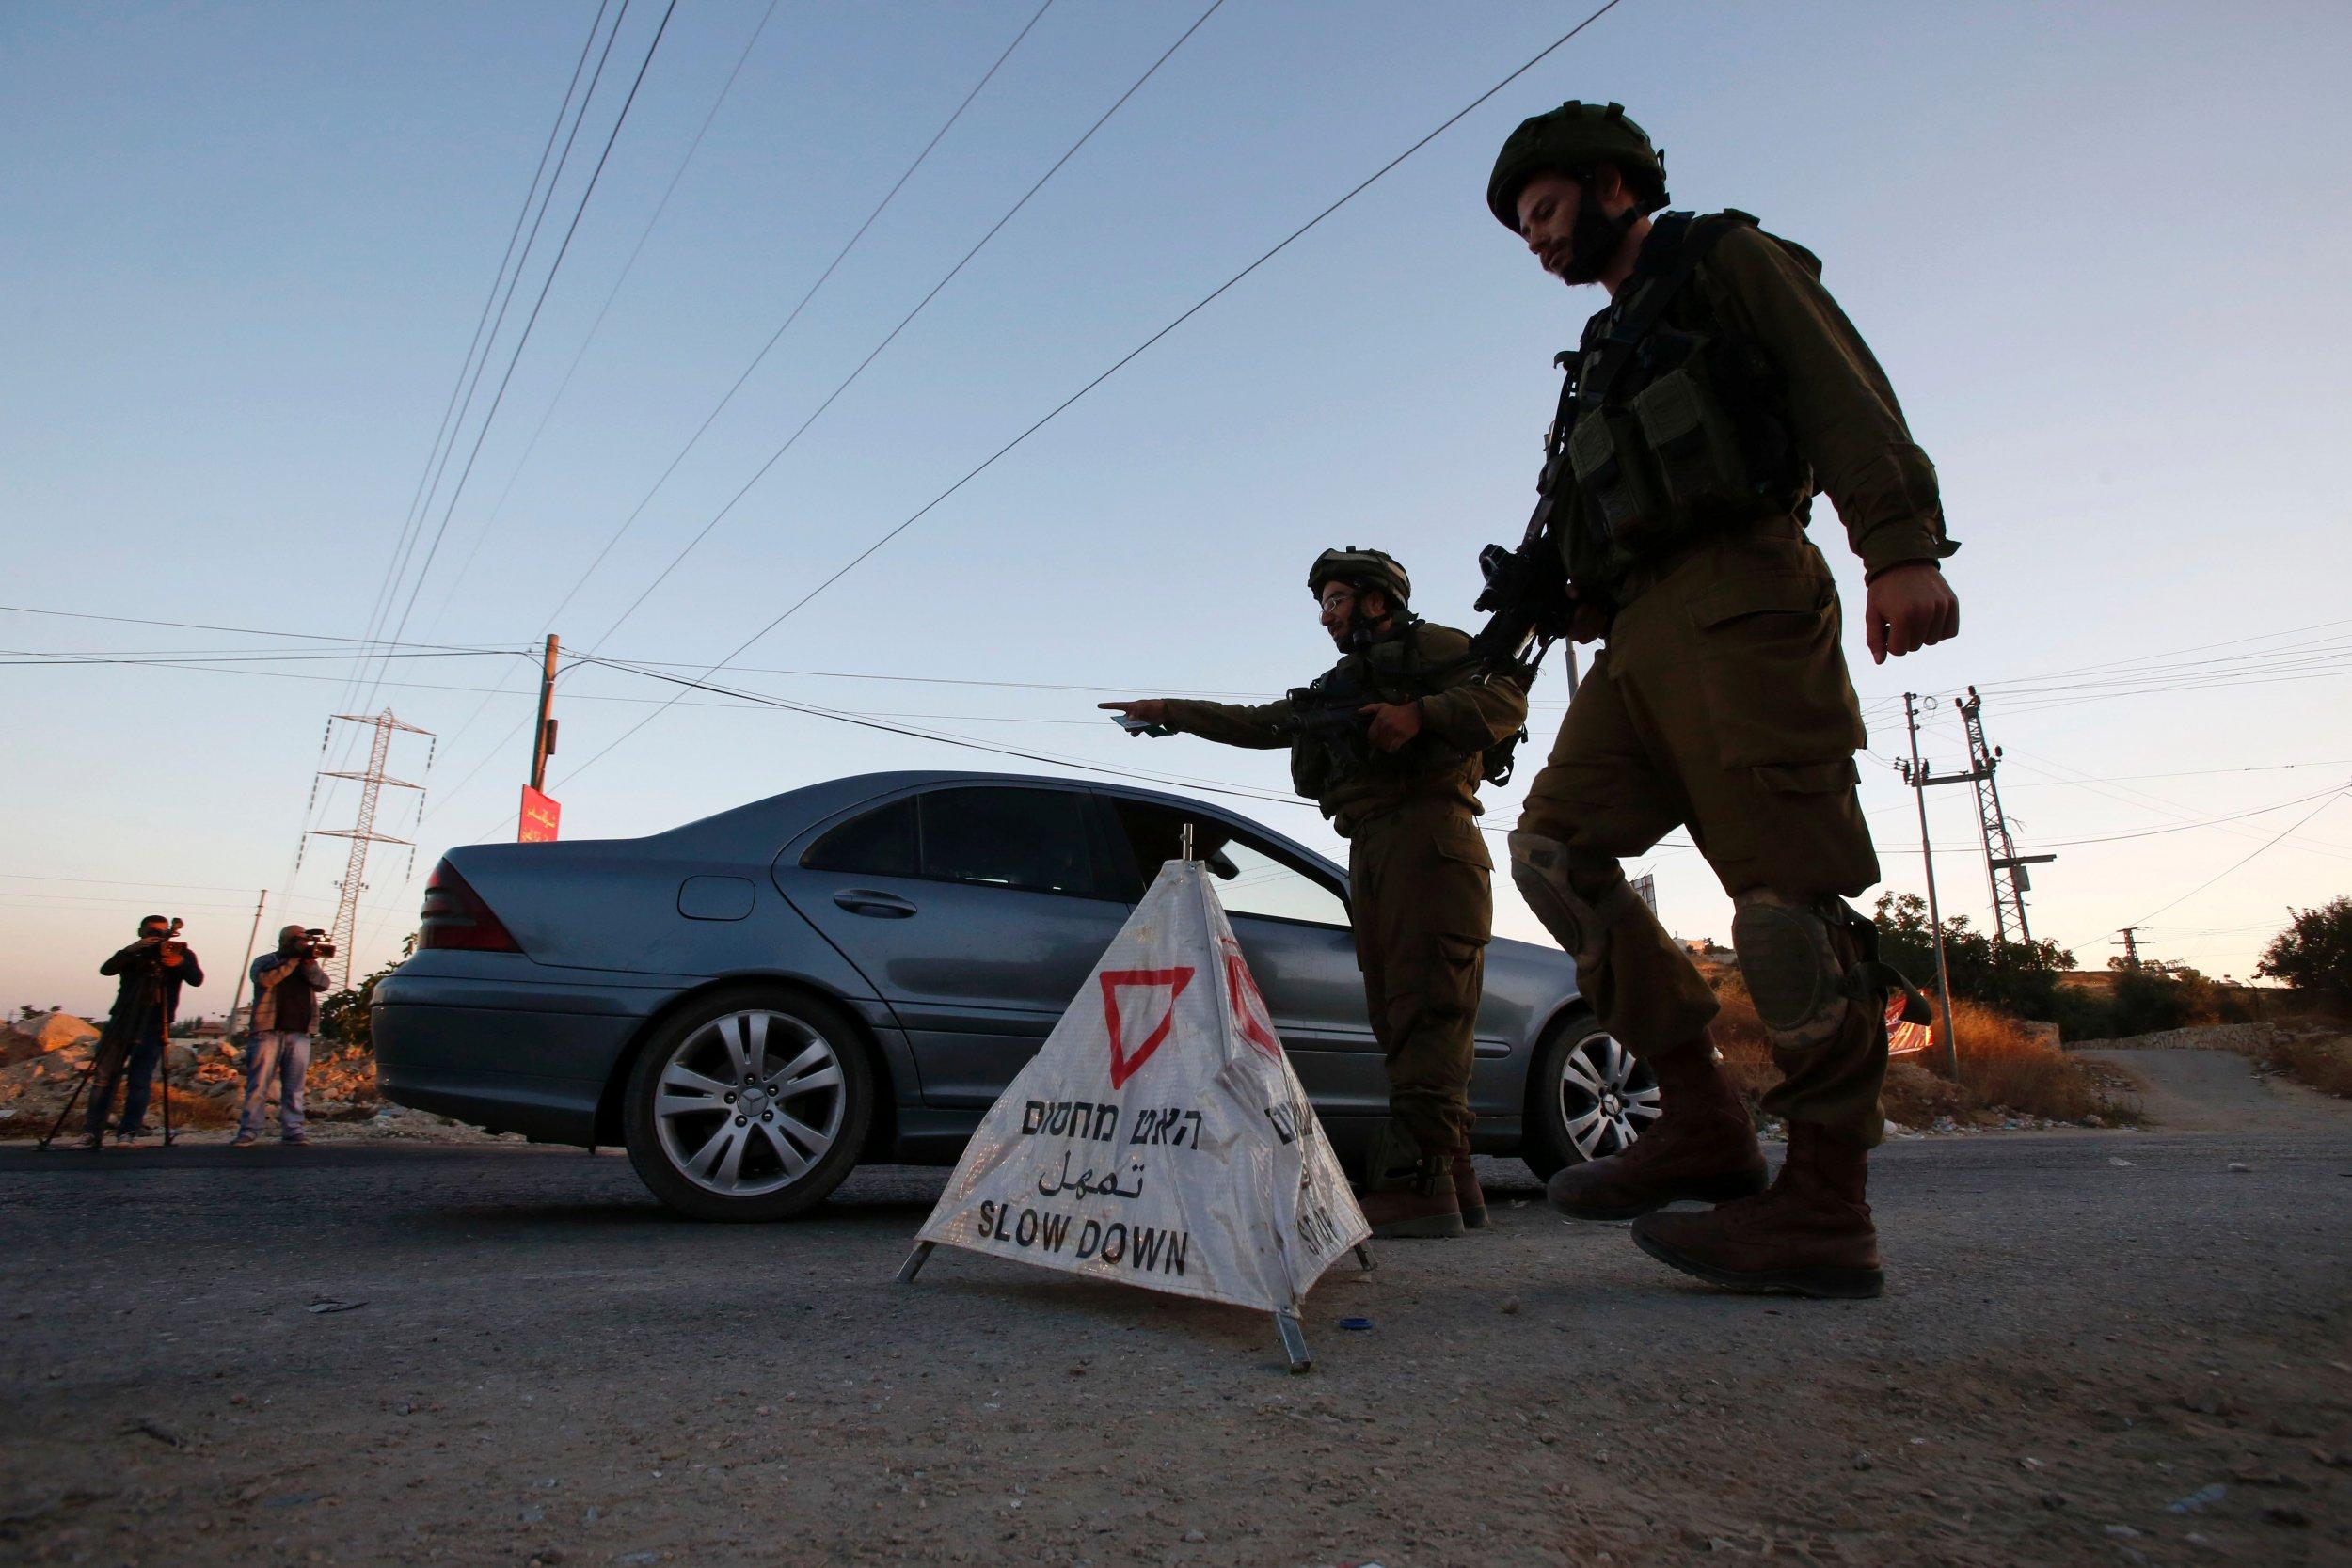 Israeli forces in Hebron